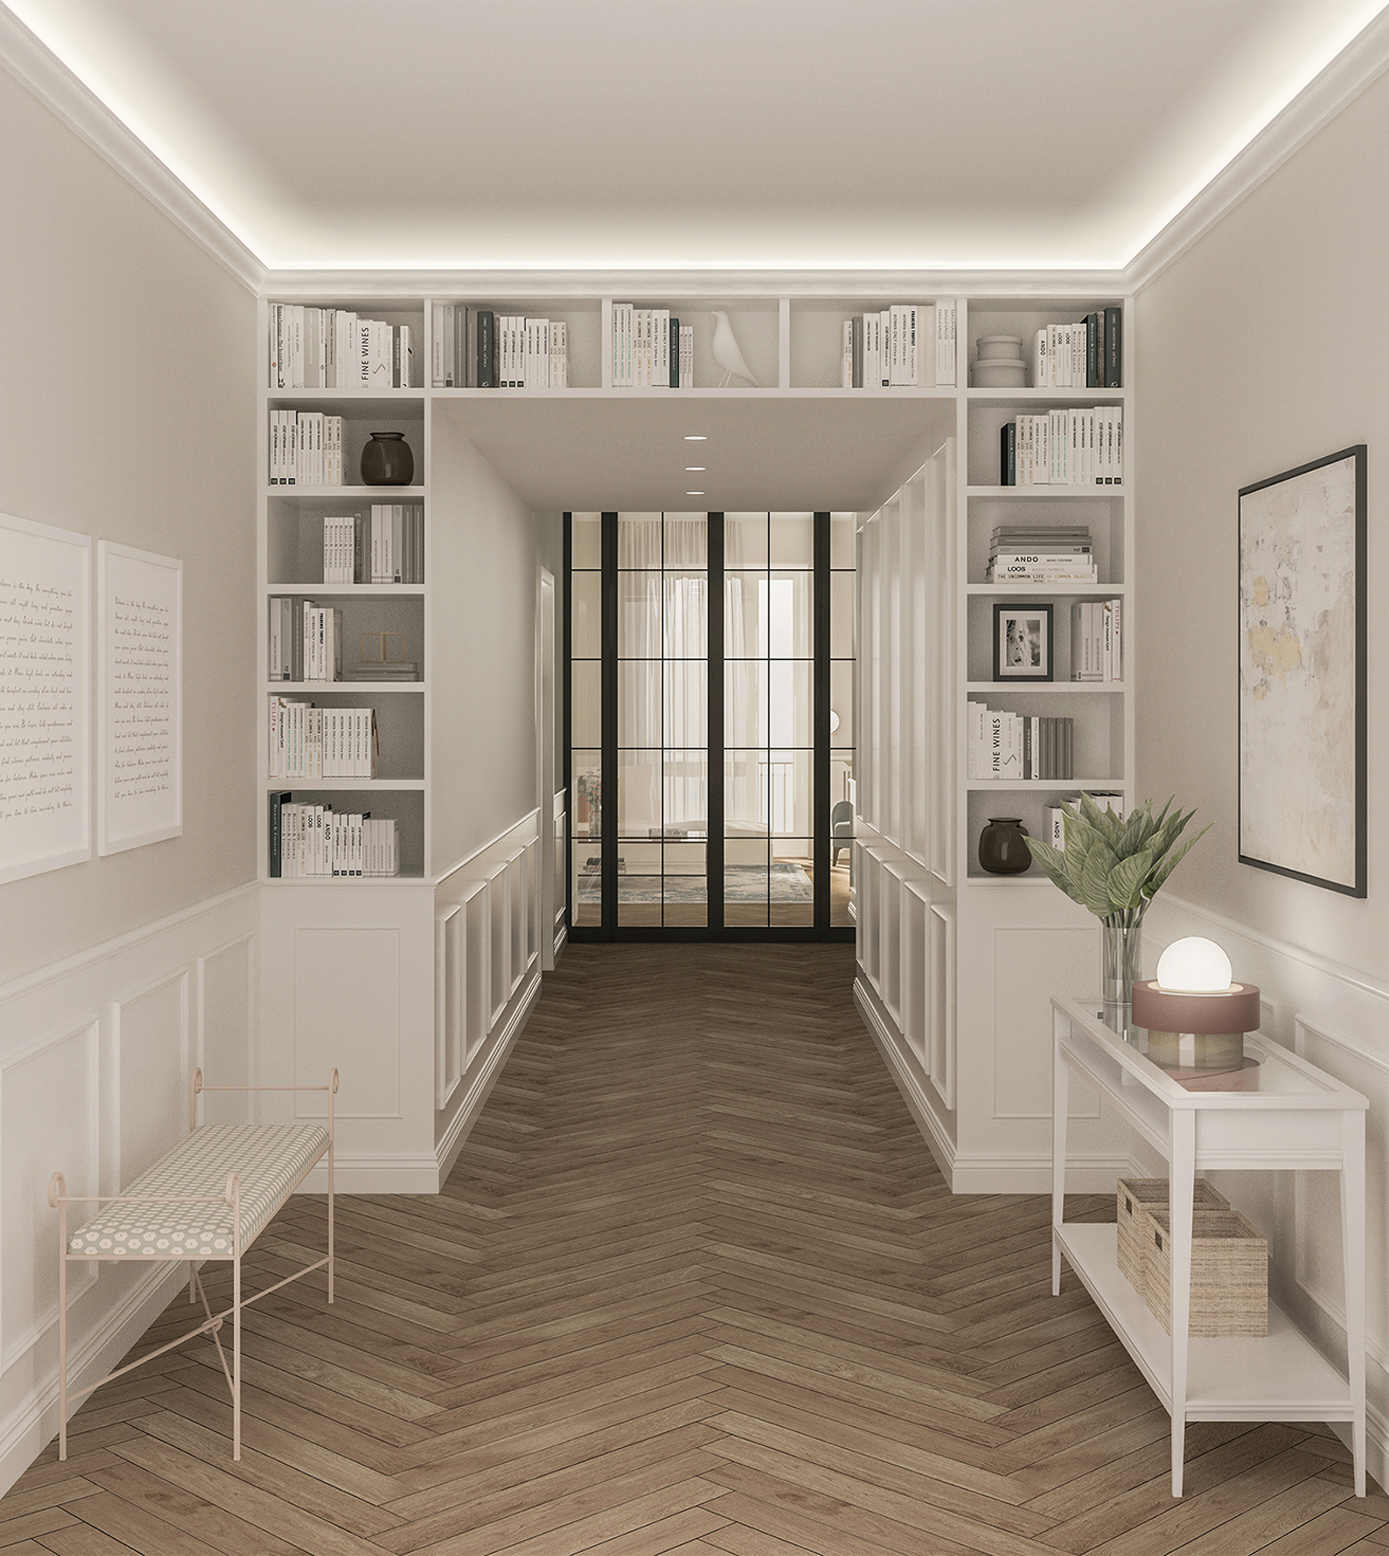 Appartamento in Milano, Ticinese - ingresso - render